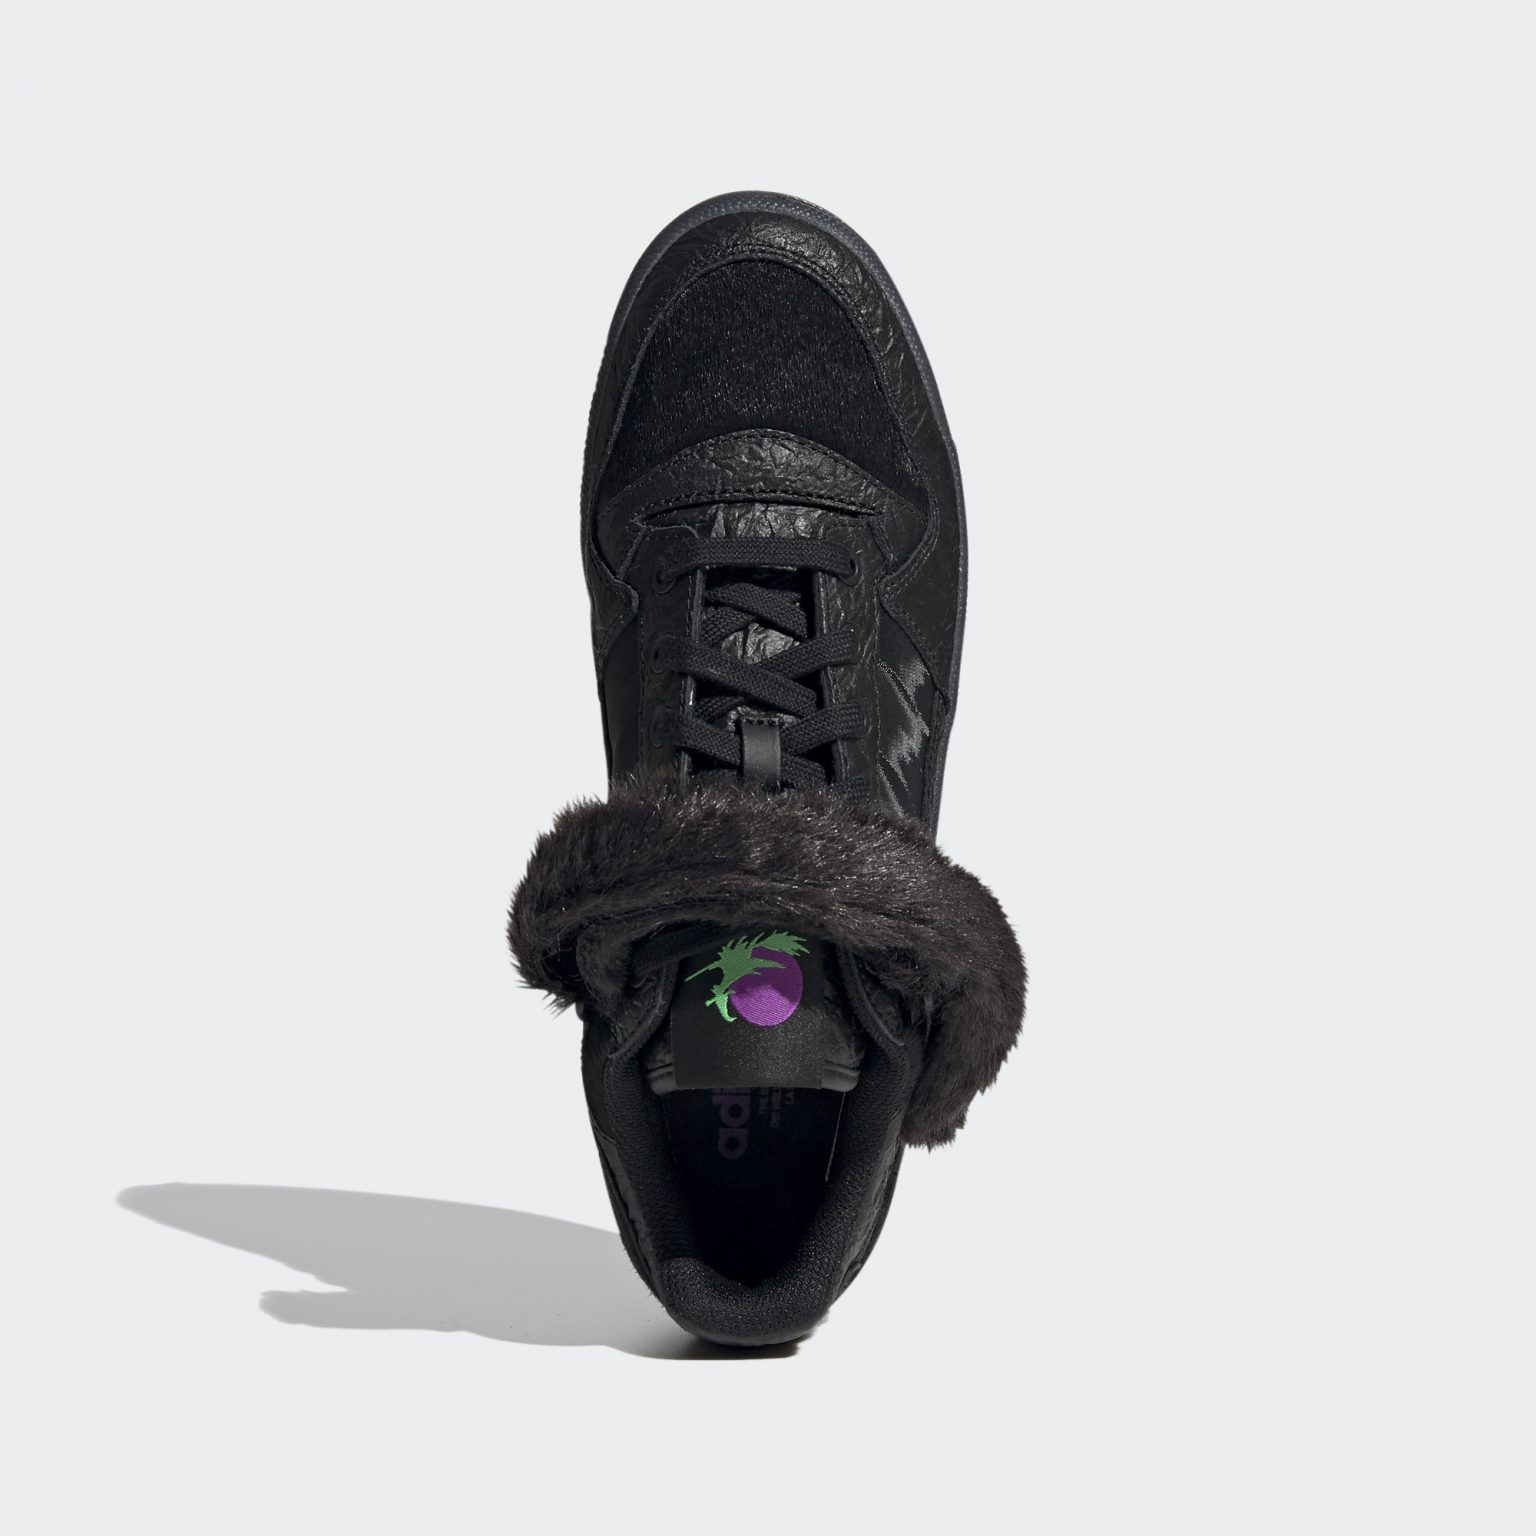 giay the thao hot tu 25-31.10.2020 adidas-halloween-elleman (6)